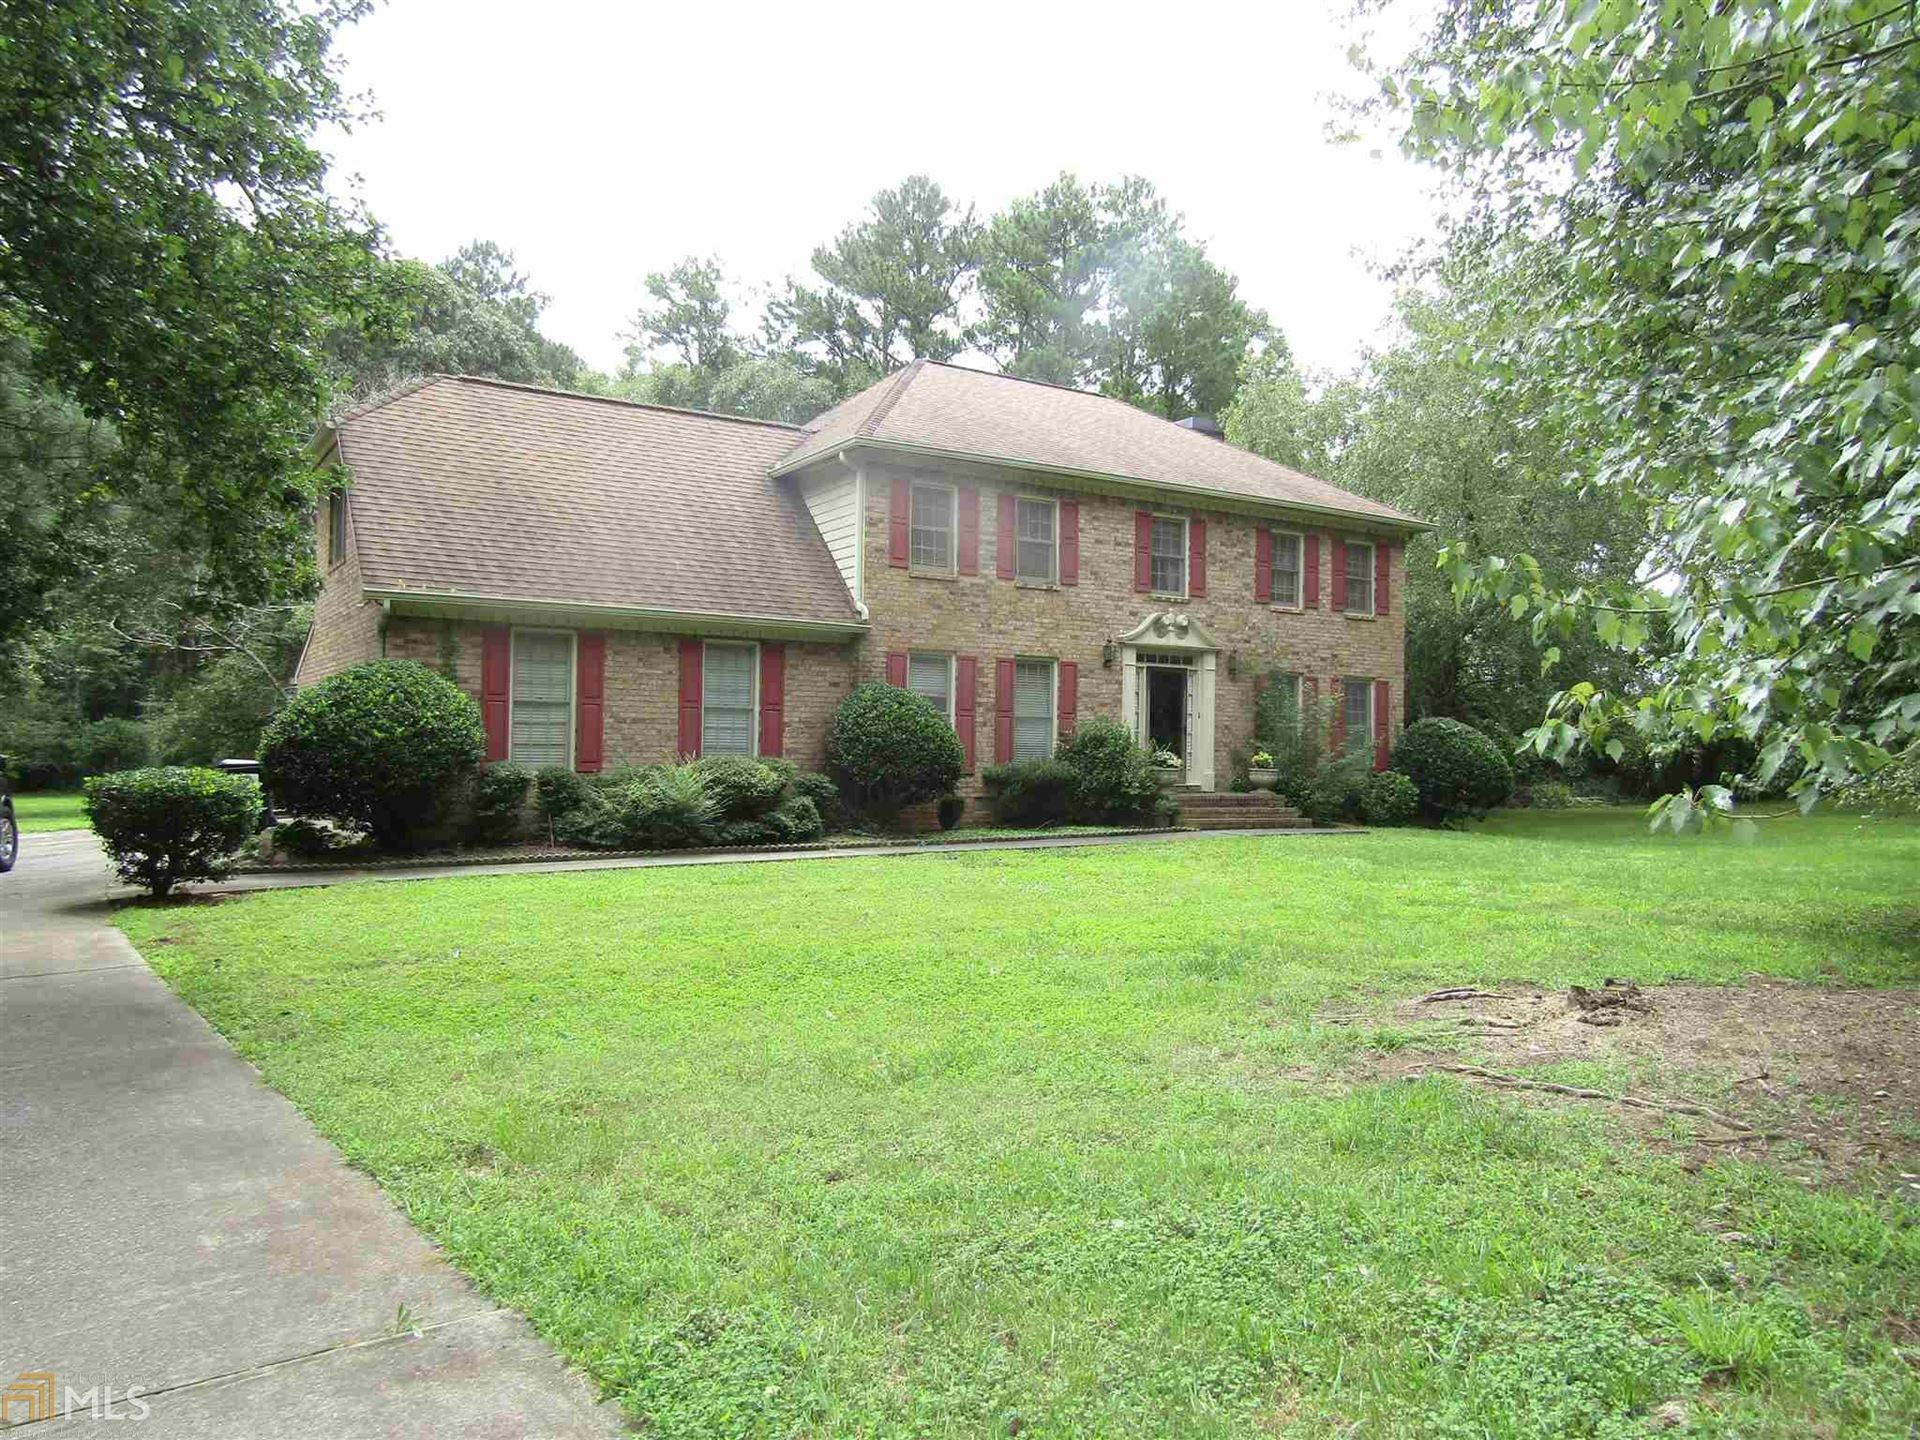 105 Creekview Trl, Fayetteville, GA 30214 - MLS#: 8861591